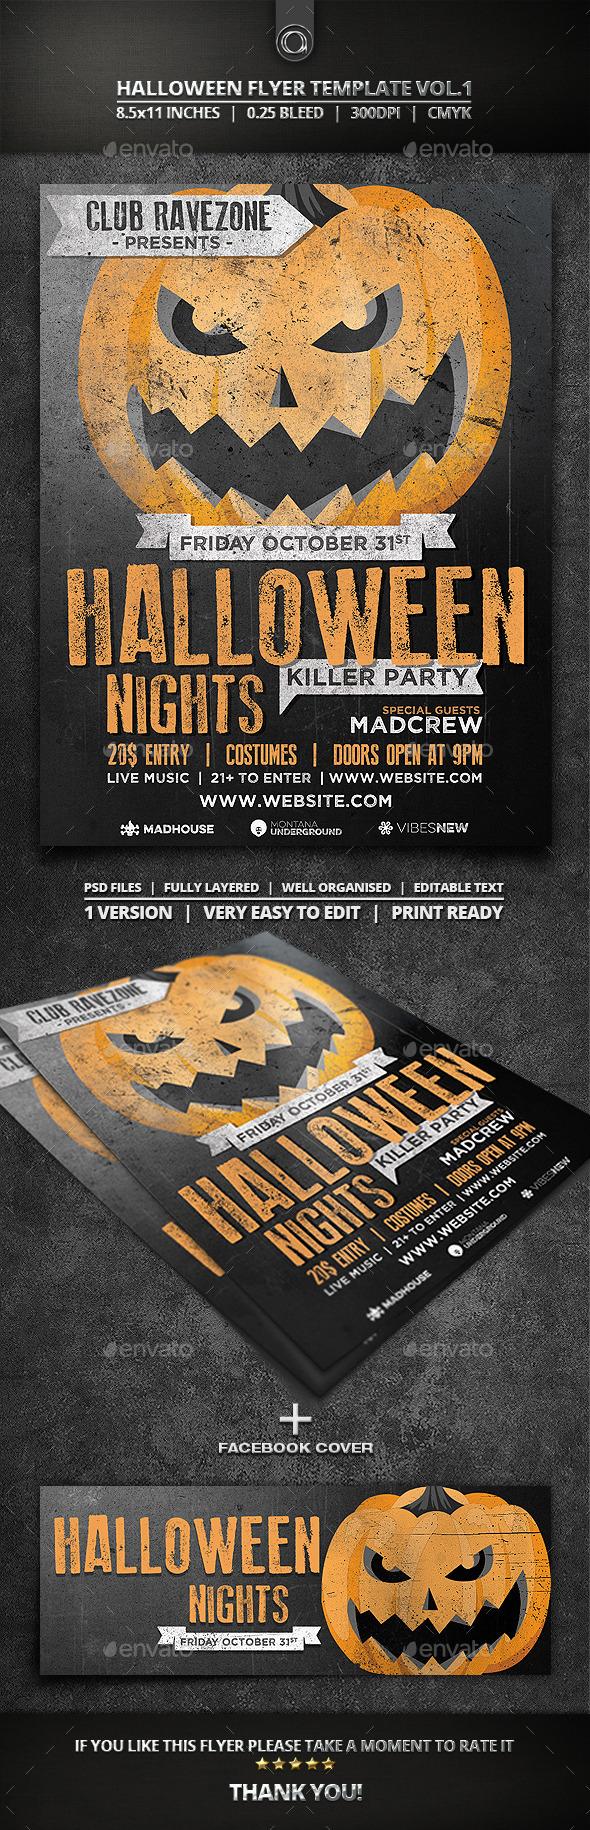 Halloween Flyer Template Vol.1 - Events Flyers